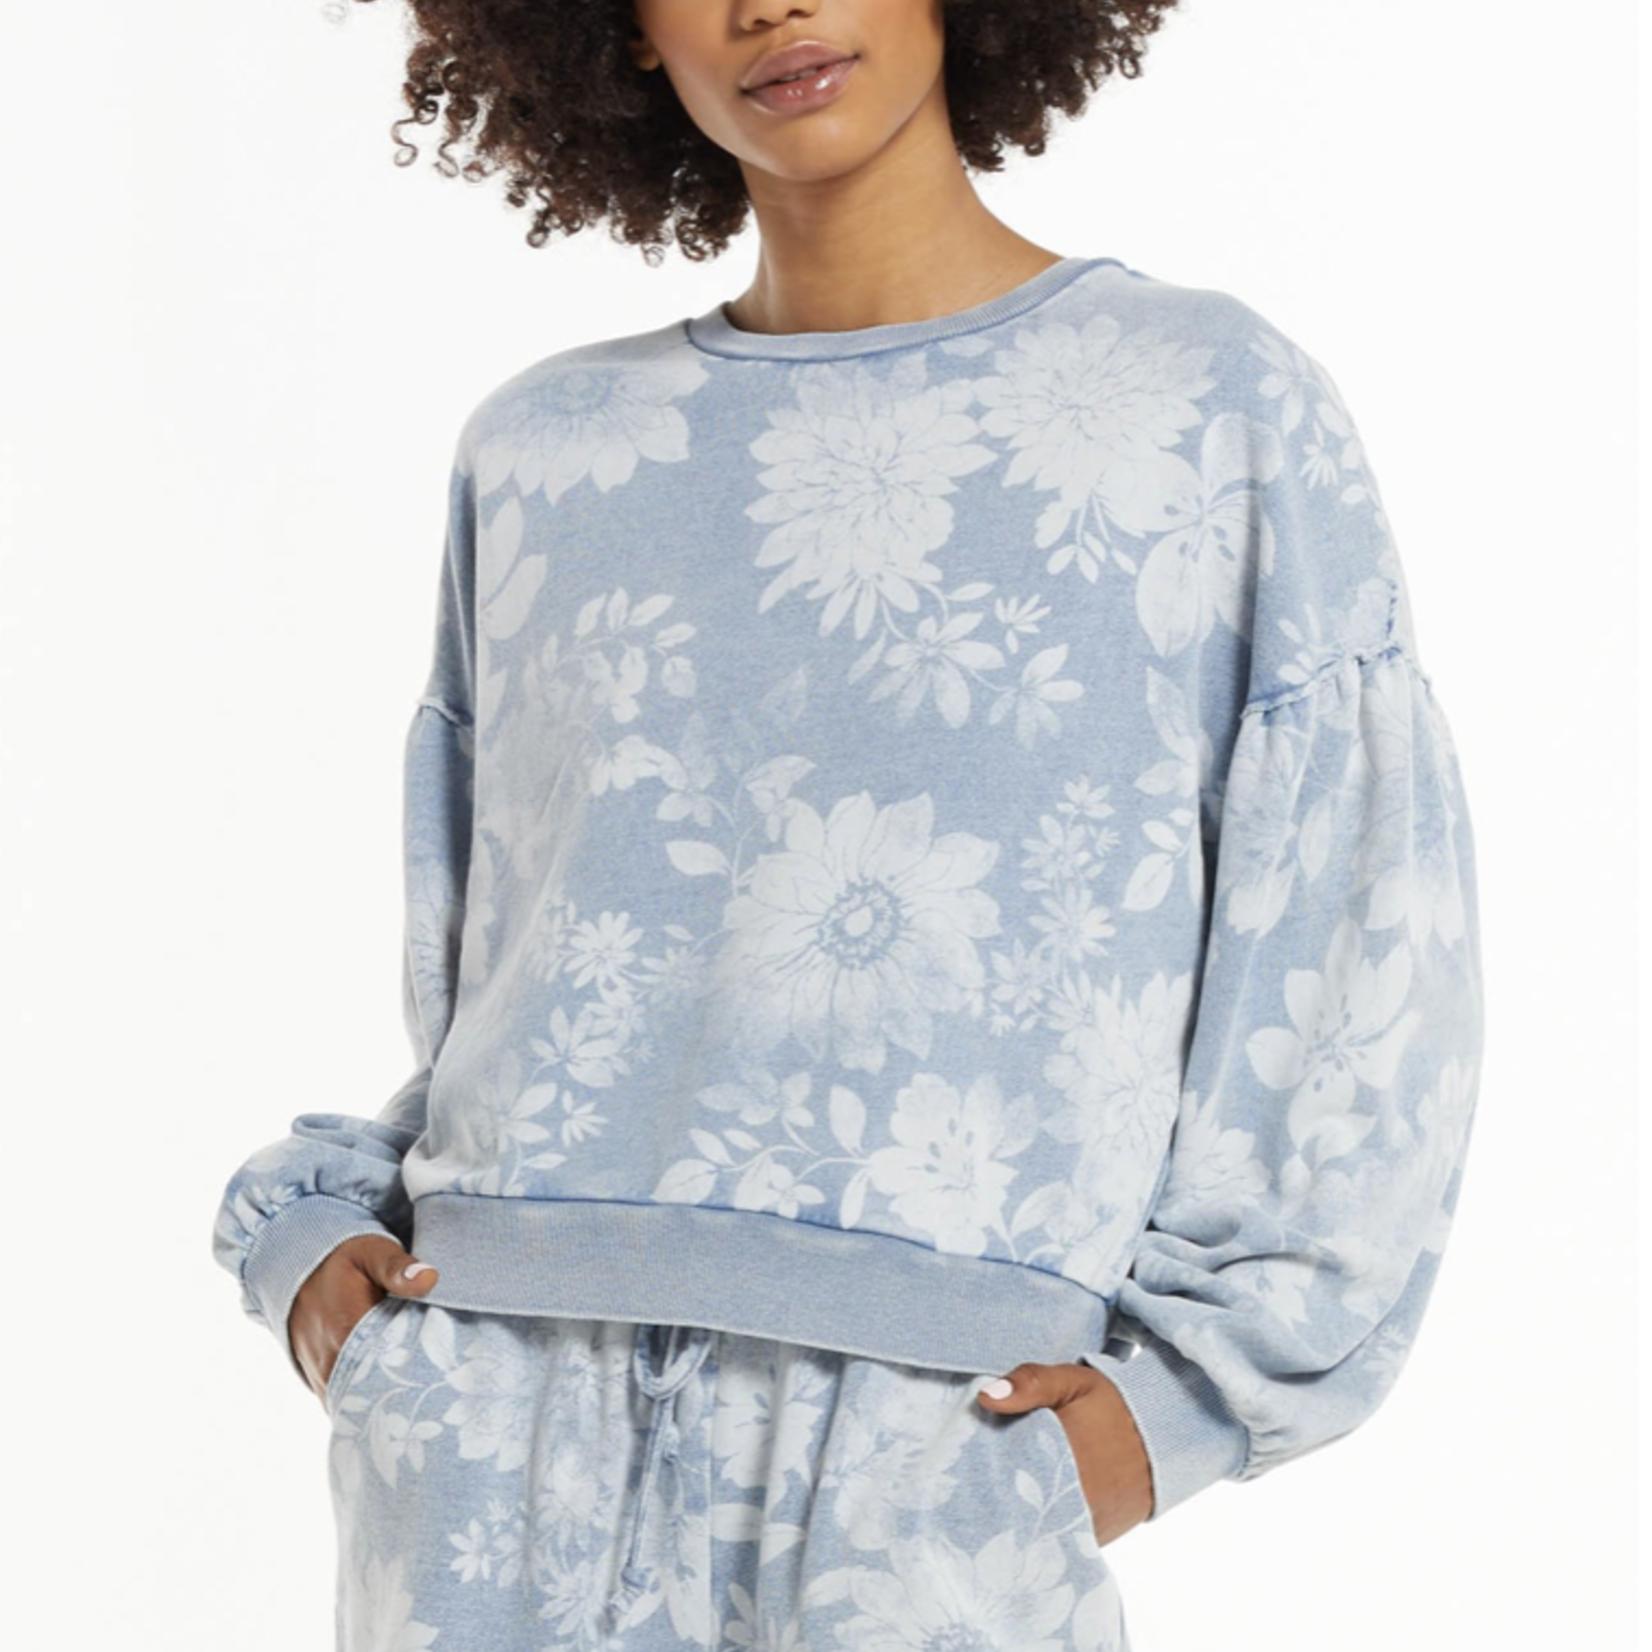 z supply Claire Floral Sweatshirt